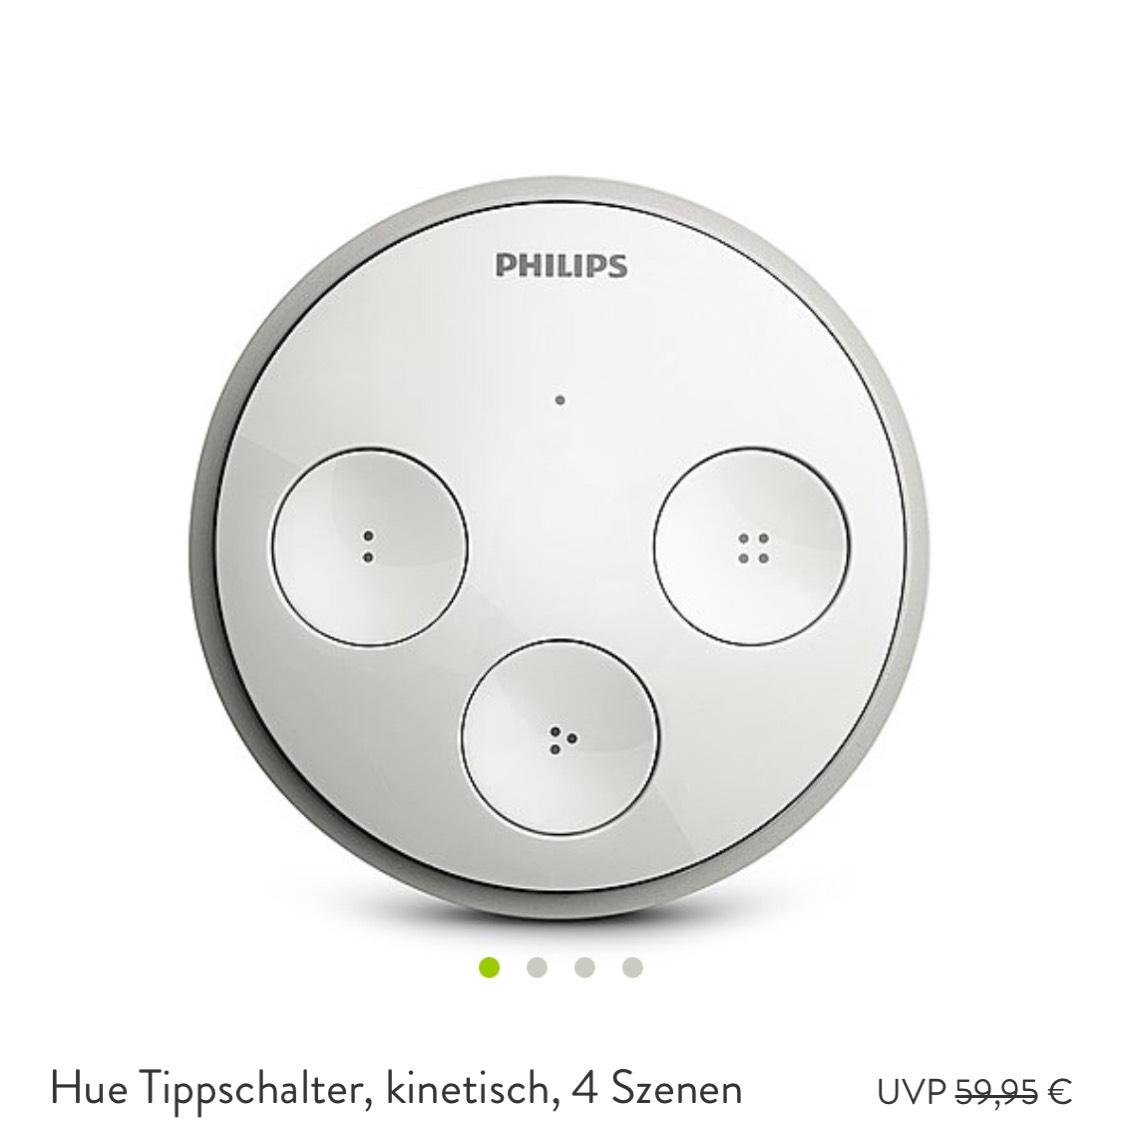 BRANDS4FRIENDS - Philips Hue im Angebot zB Tap 39,99